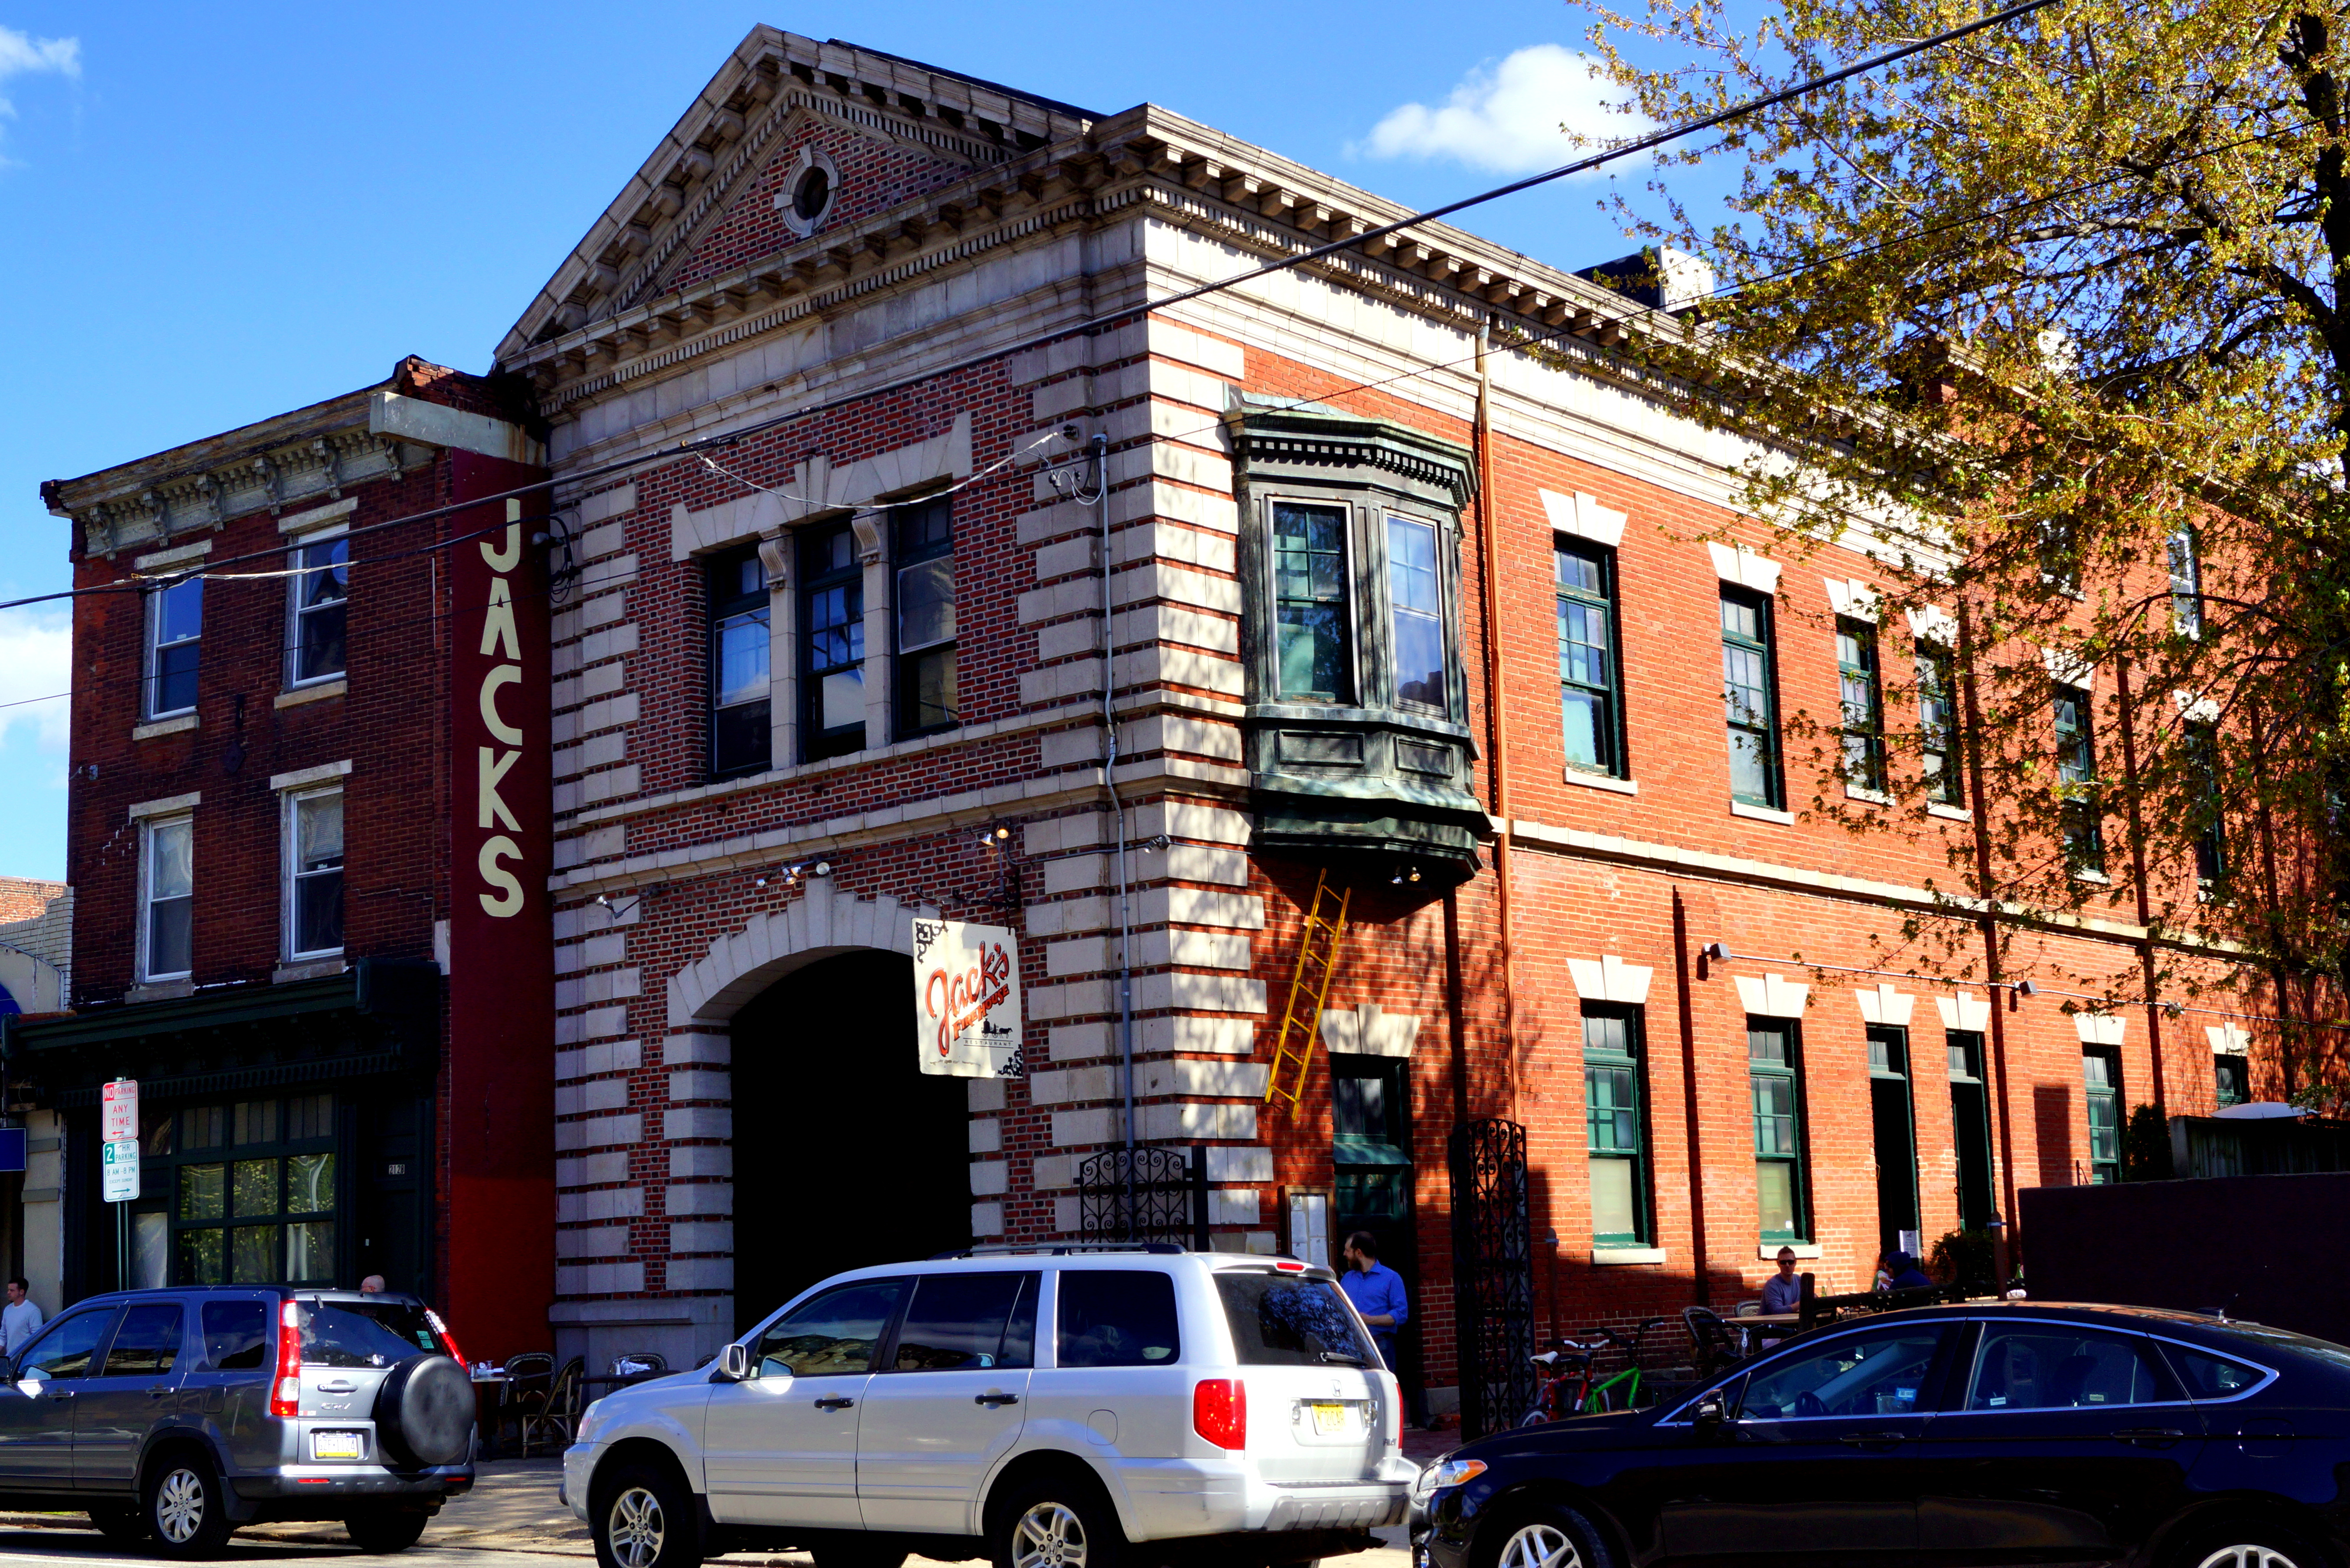 Worth Avenue Jack S Firehouse Philadelphia Pa Cello S Corner